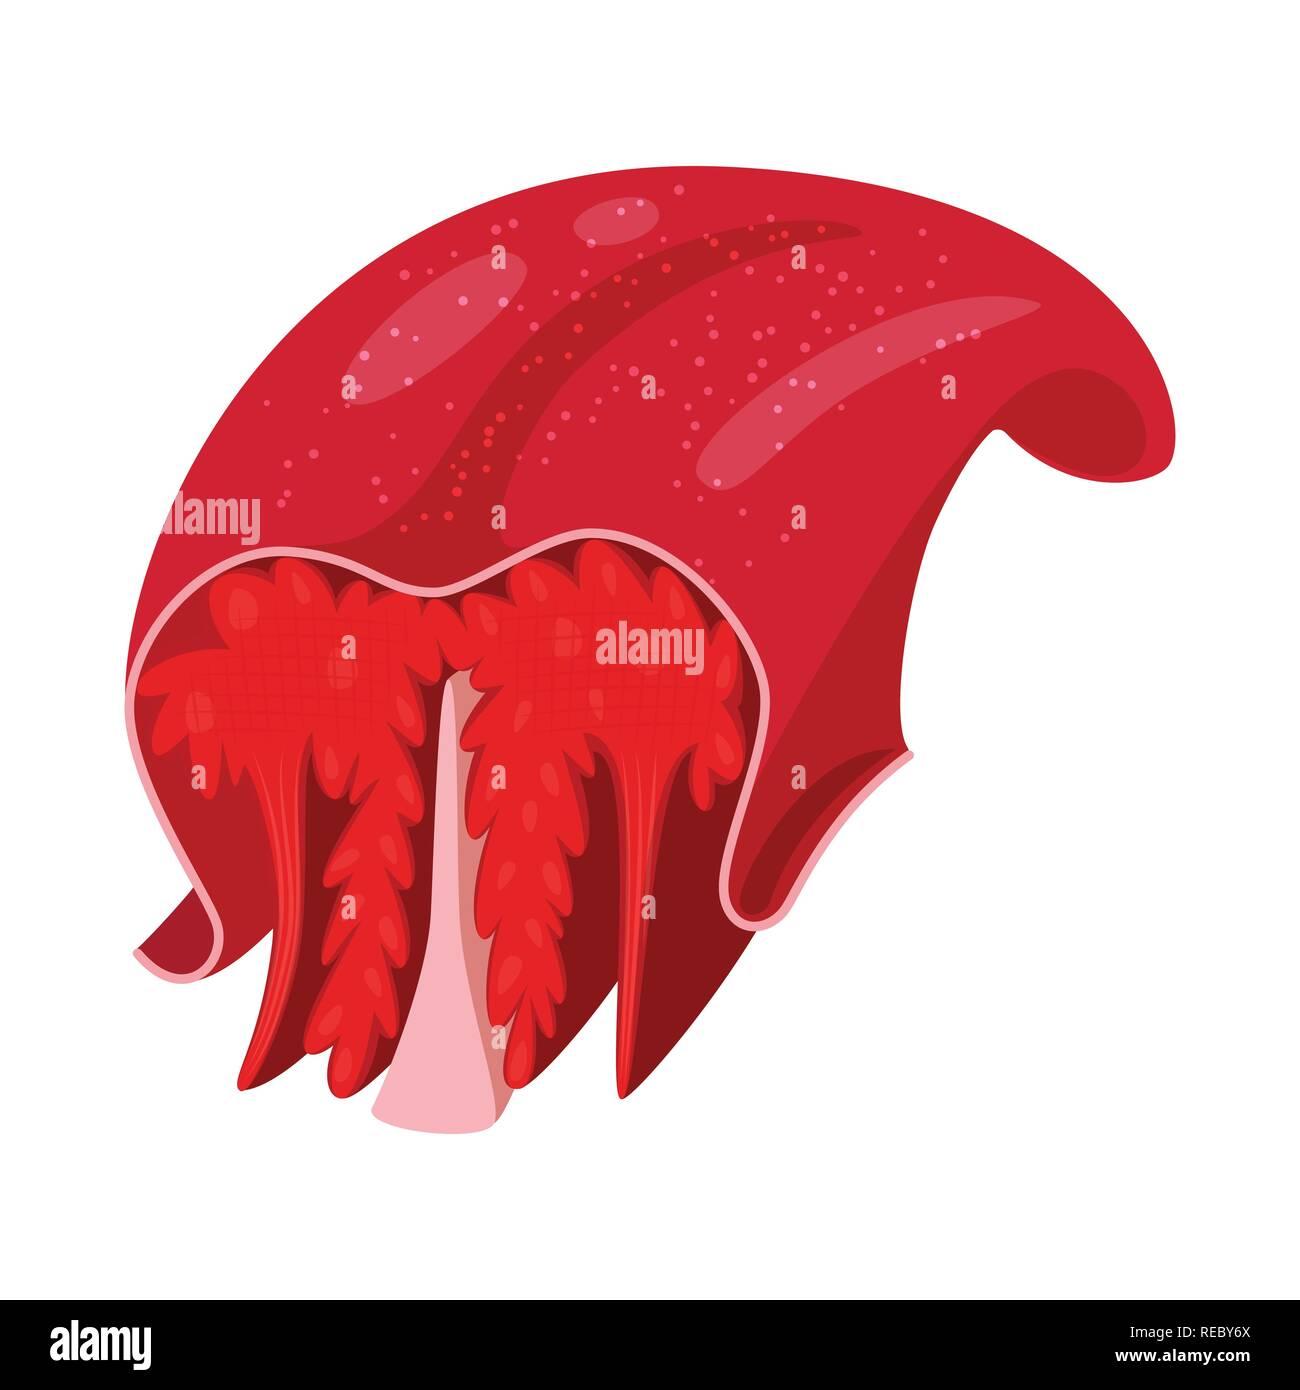 Lengua úvula Contracción Jefe Boca Medical Cara Sanidad